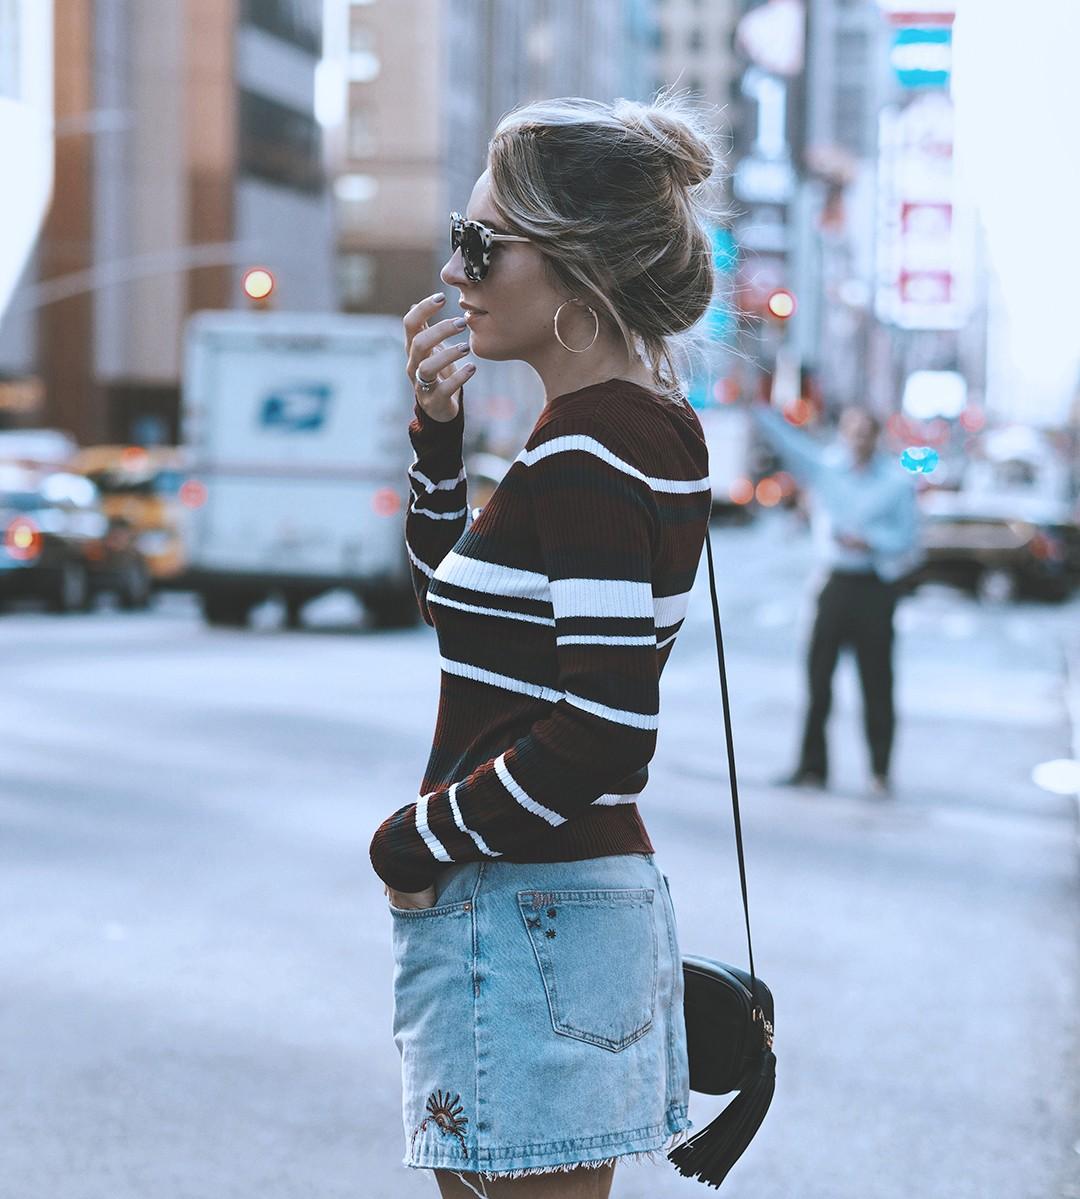 nyfw-street-style-september-2016-fashion-blogger-denim-skirt-knit-sweater-2016